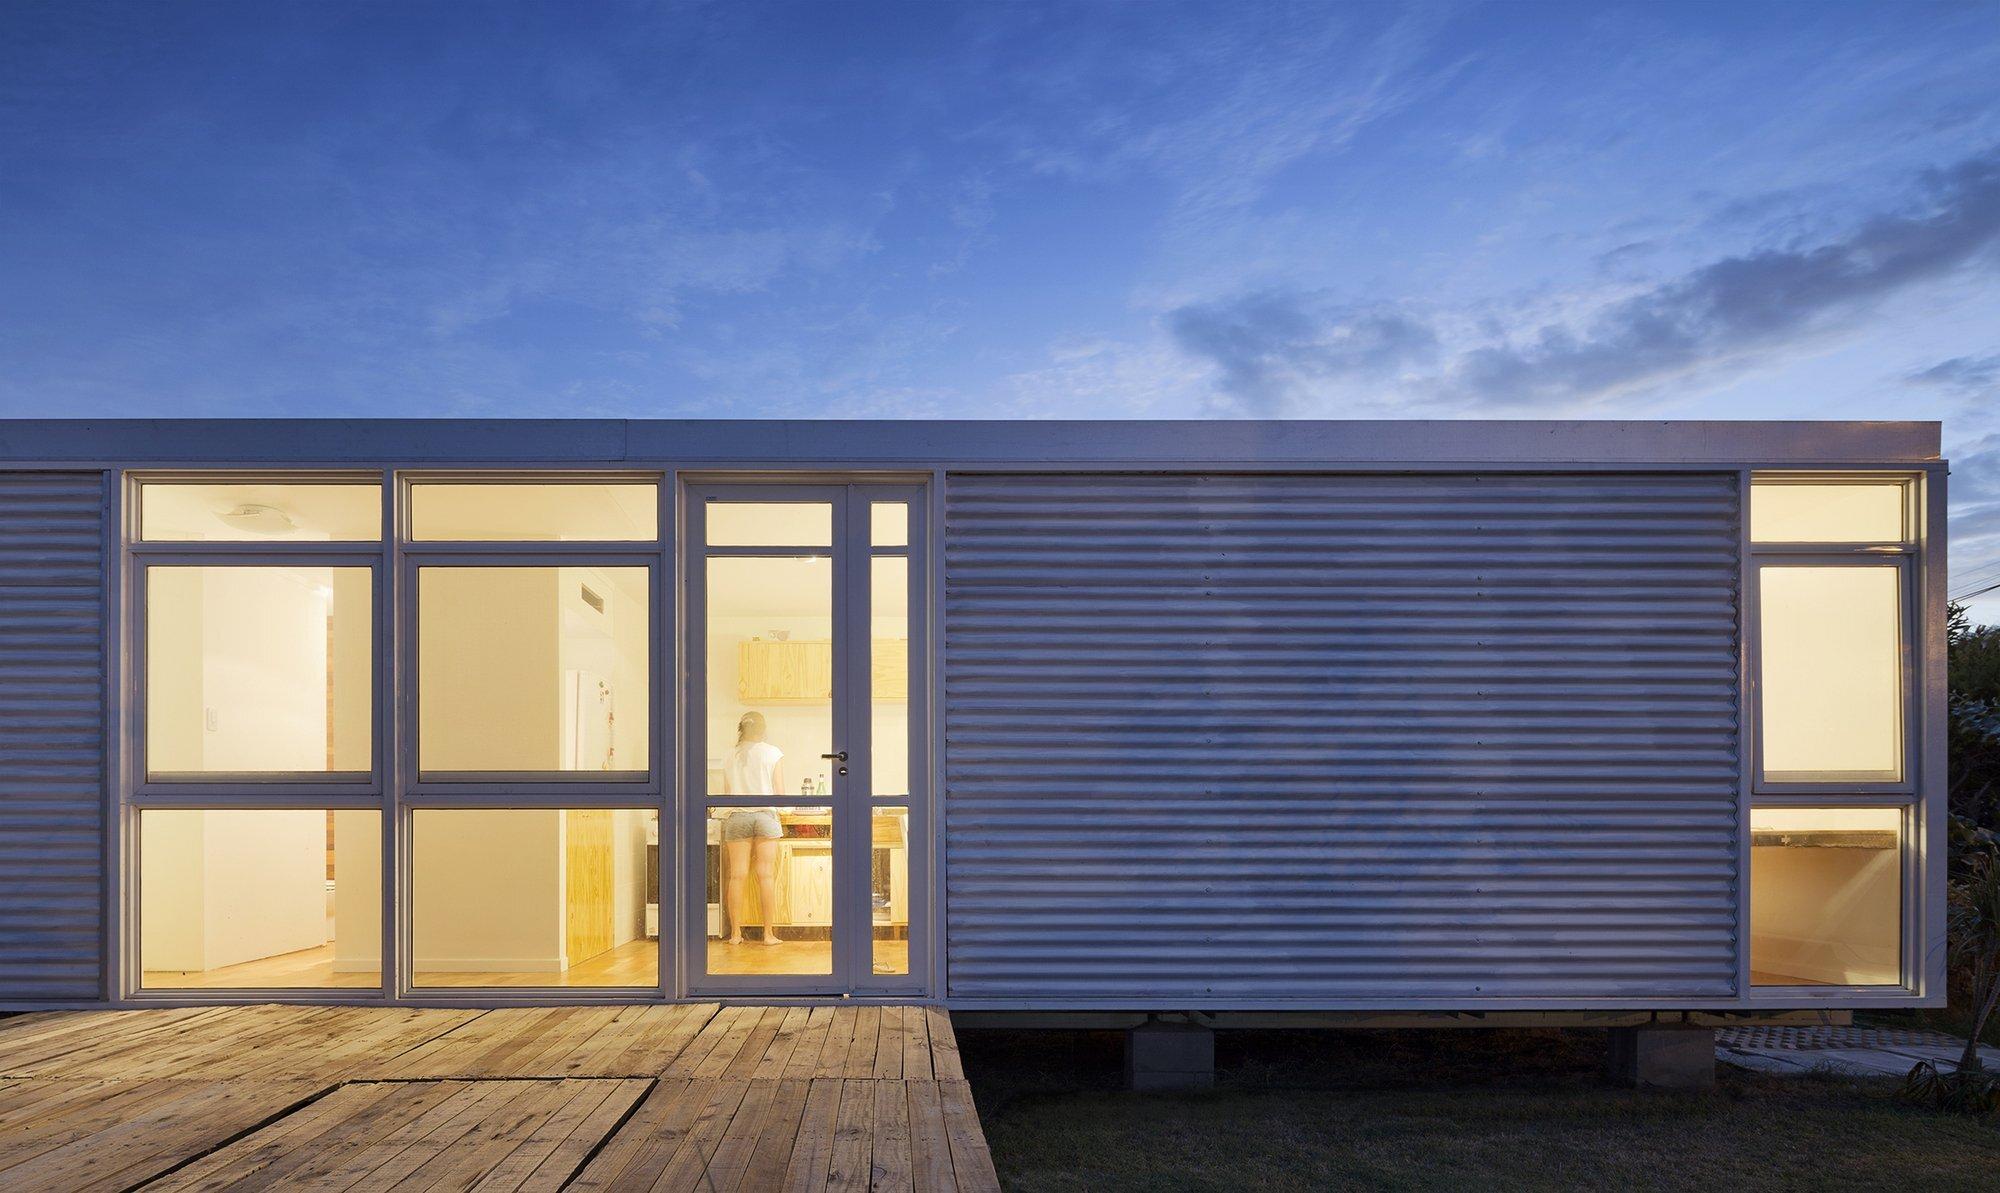 Mía House - Matias Pons Estel - Argentina - Small House - Exterior Night - Humble Homes